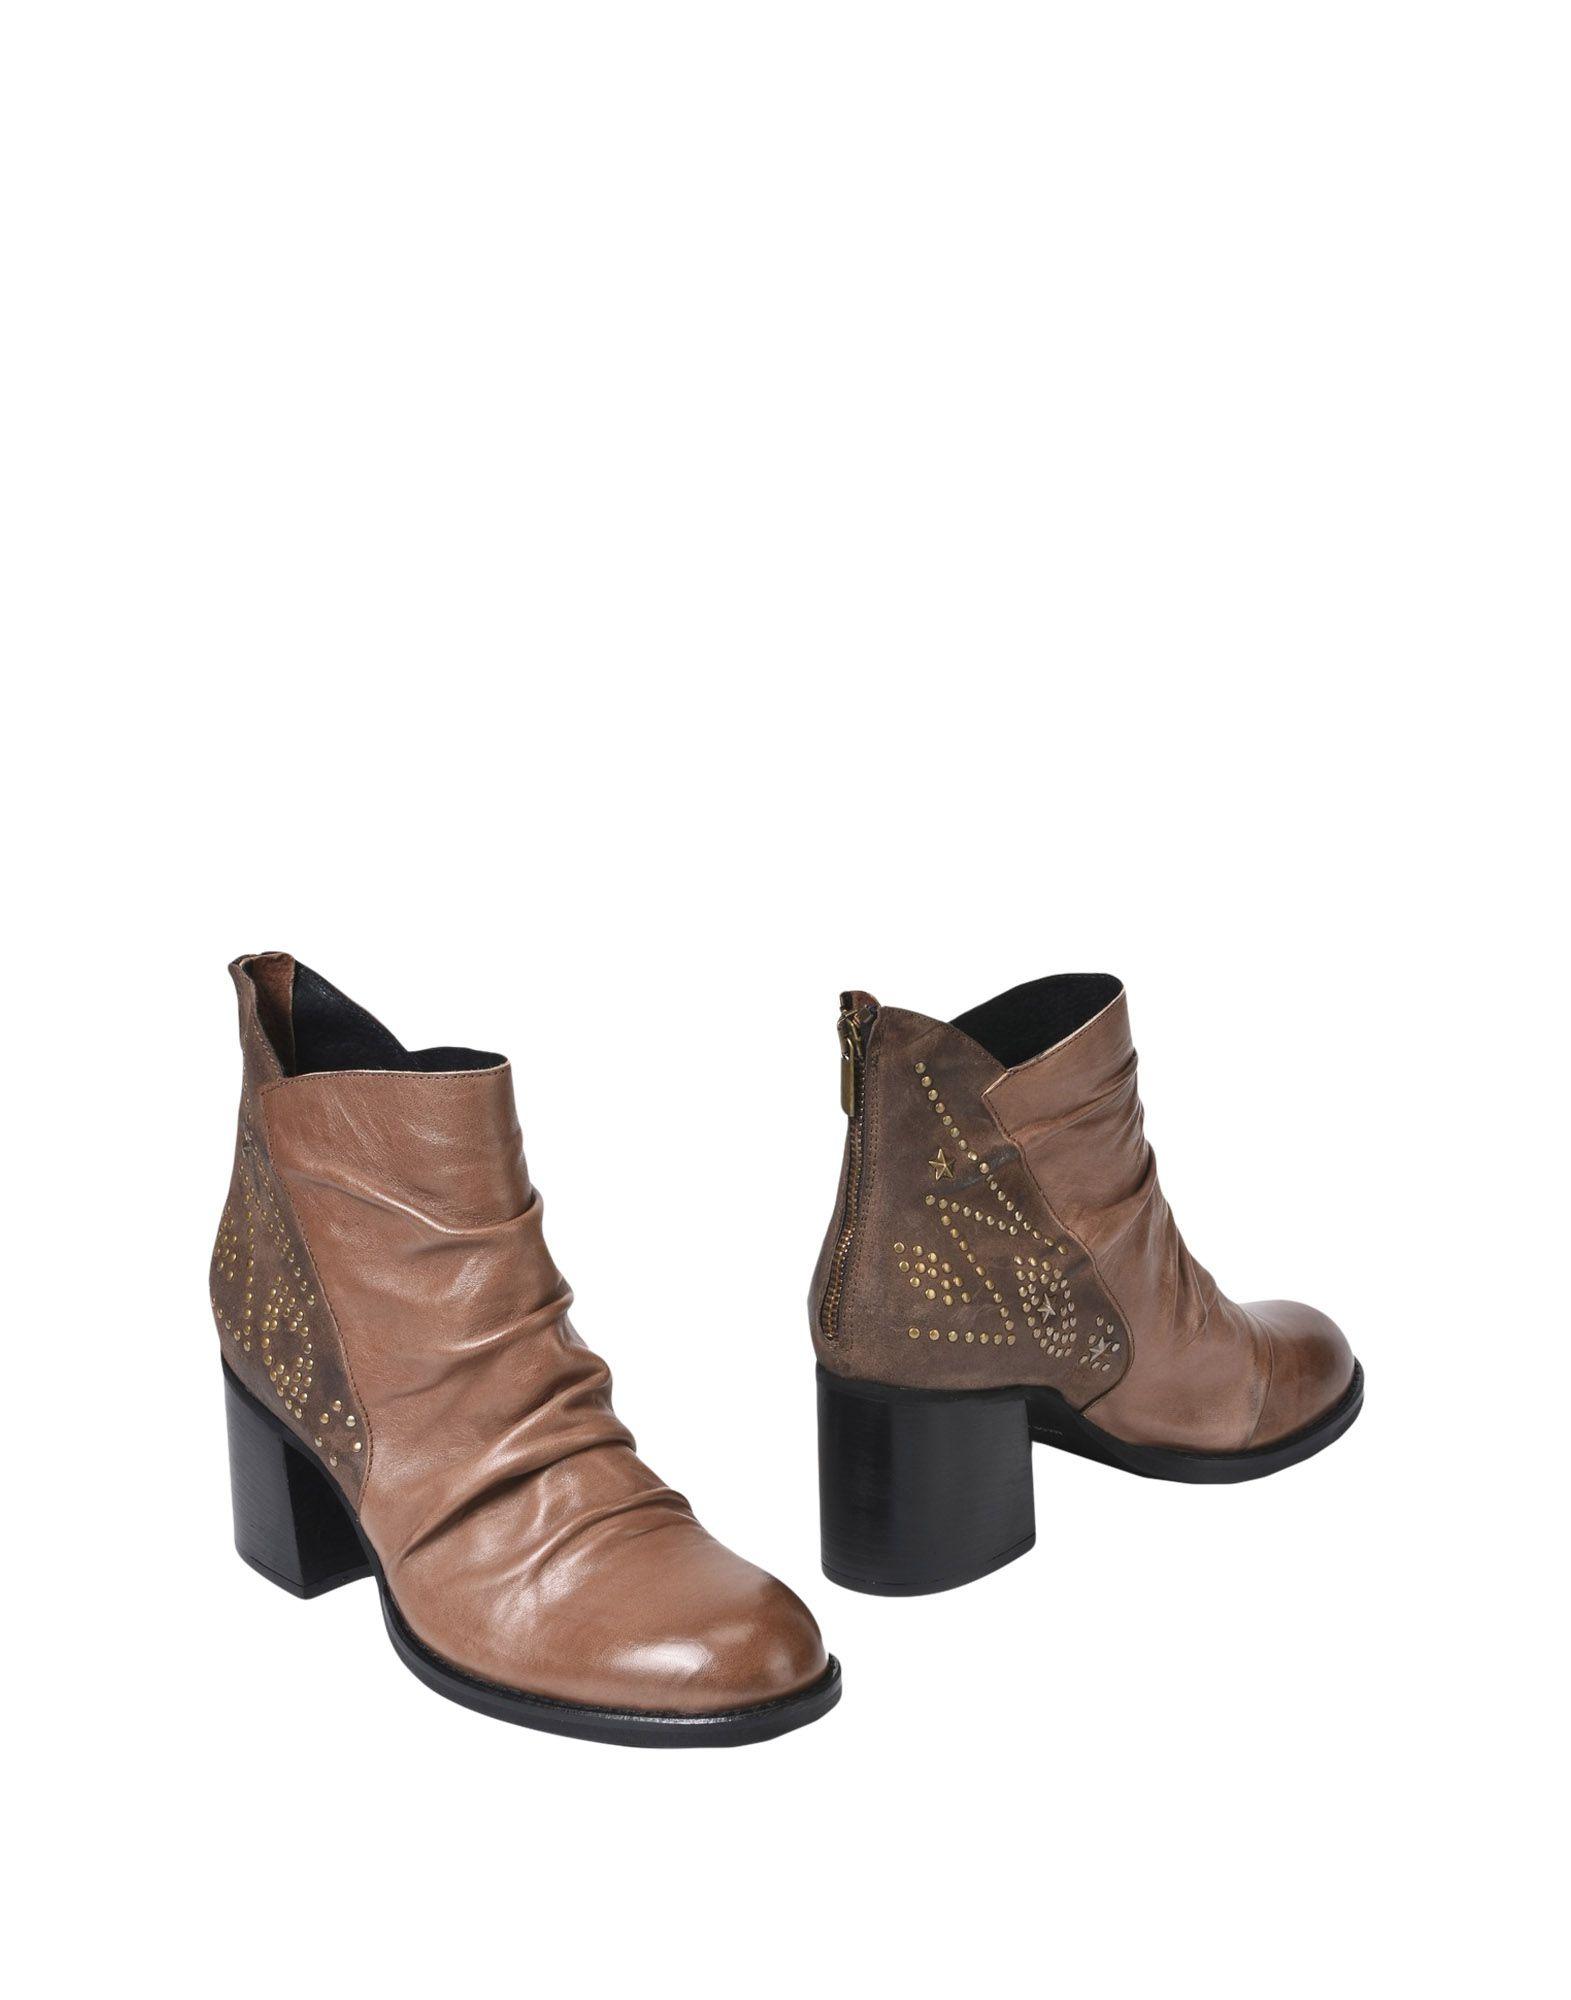 Stilvolle billige  Schuhe Emozioni Stiefelette Damen  billige 11538075HQ 60b544